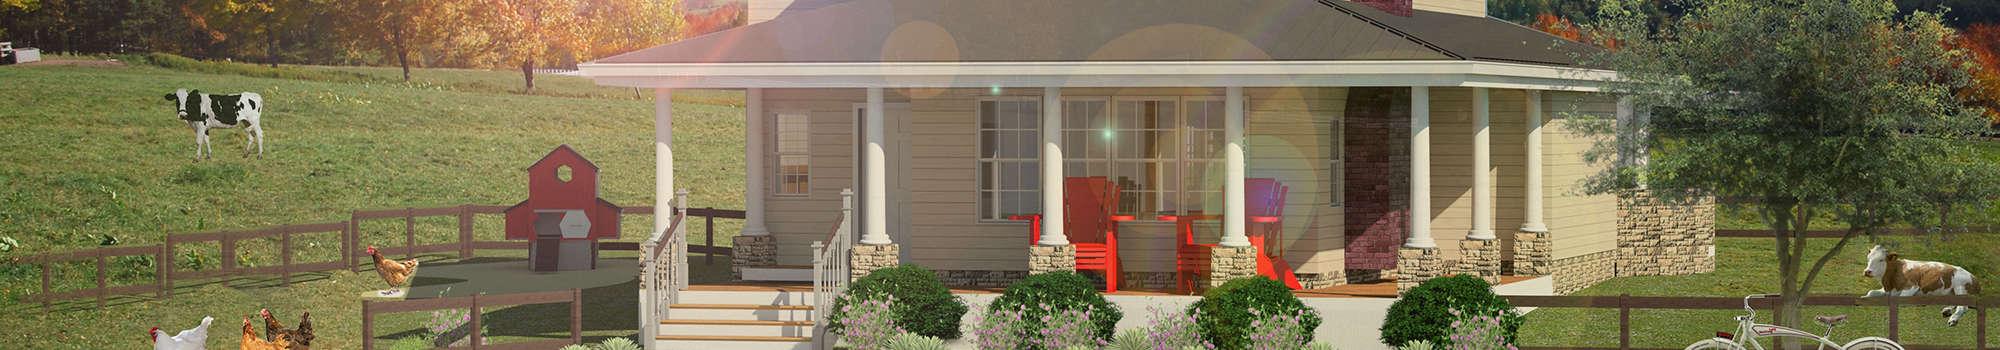 Energy Effiecient Home Design Pionarch Llc